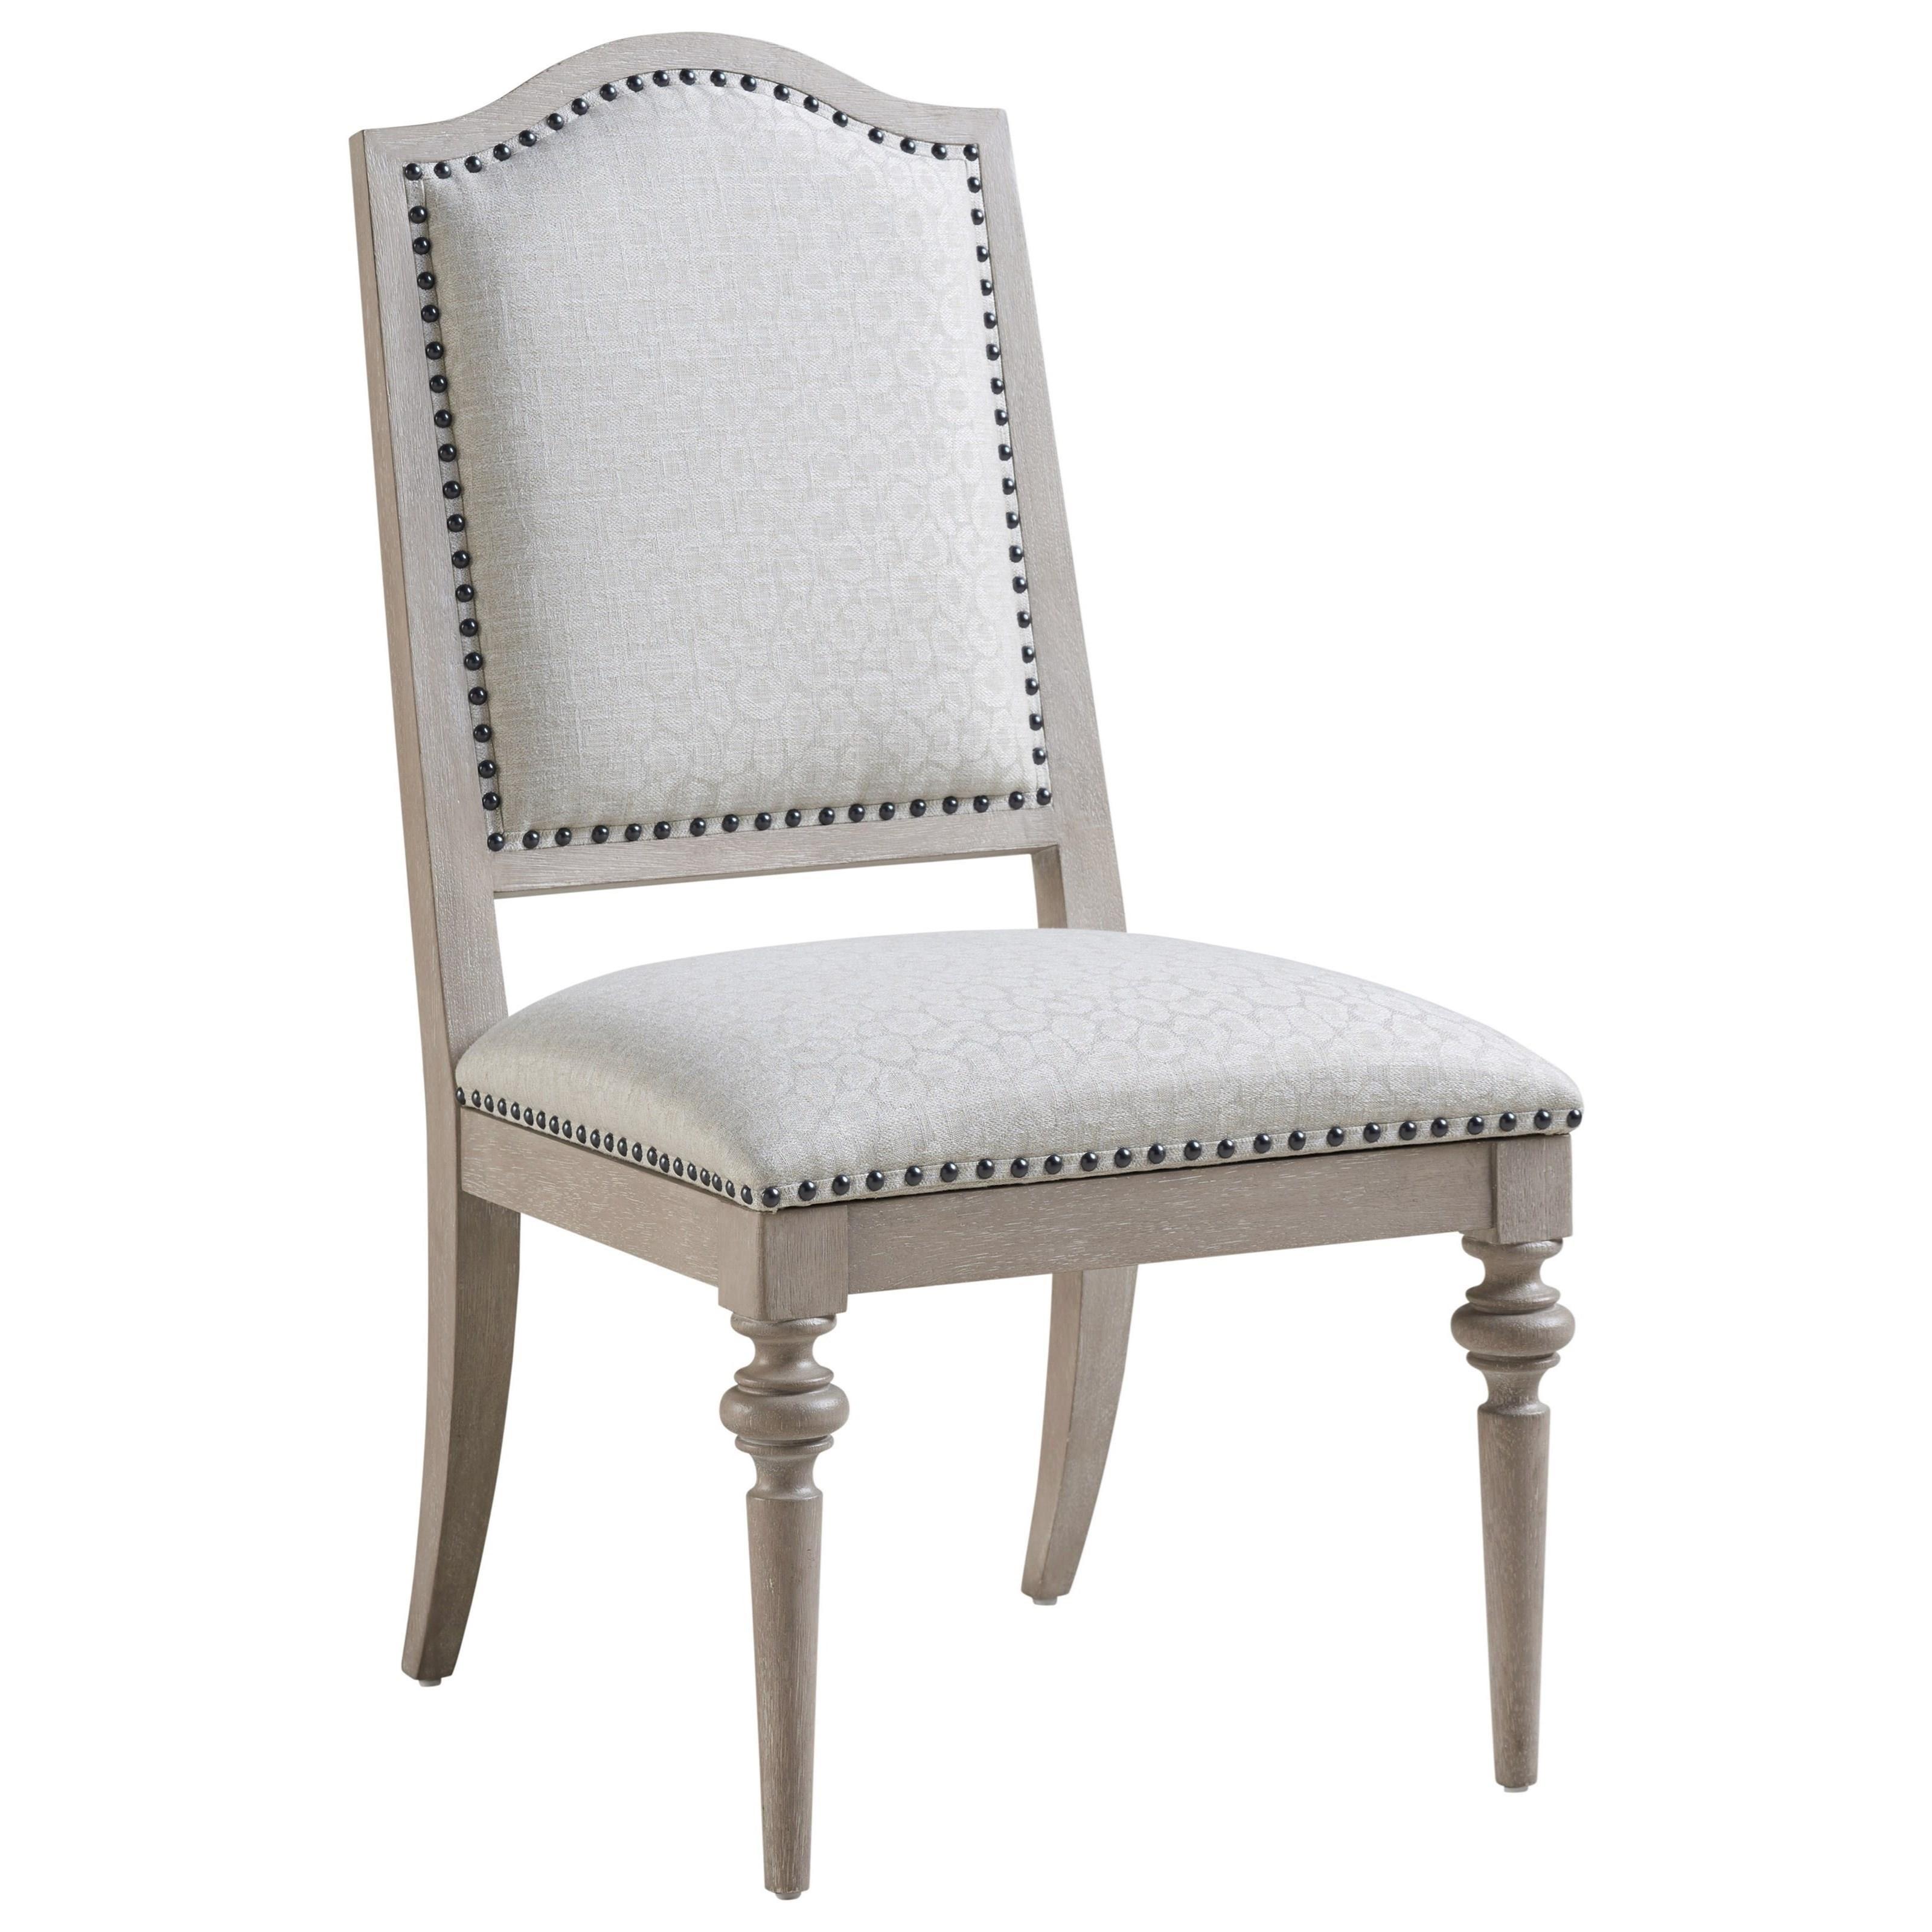 Malibu Aidan Upholstered Side Chair by Barclay Butera at Baer's Furniture